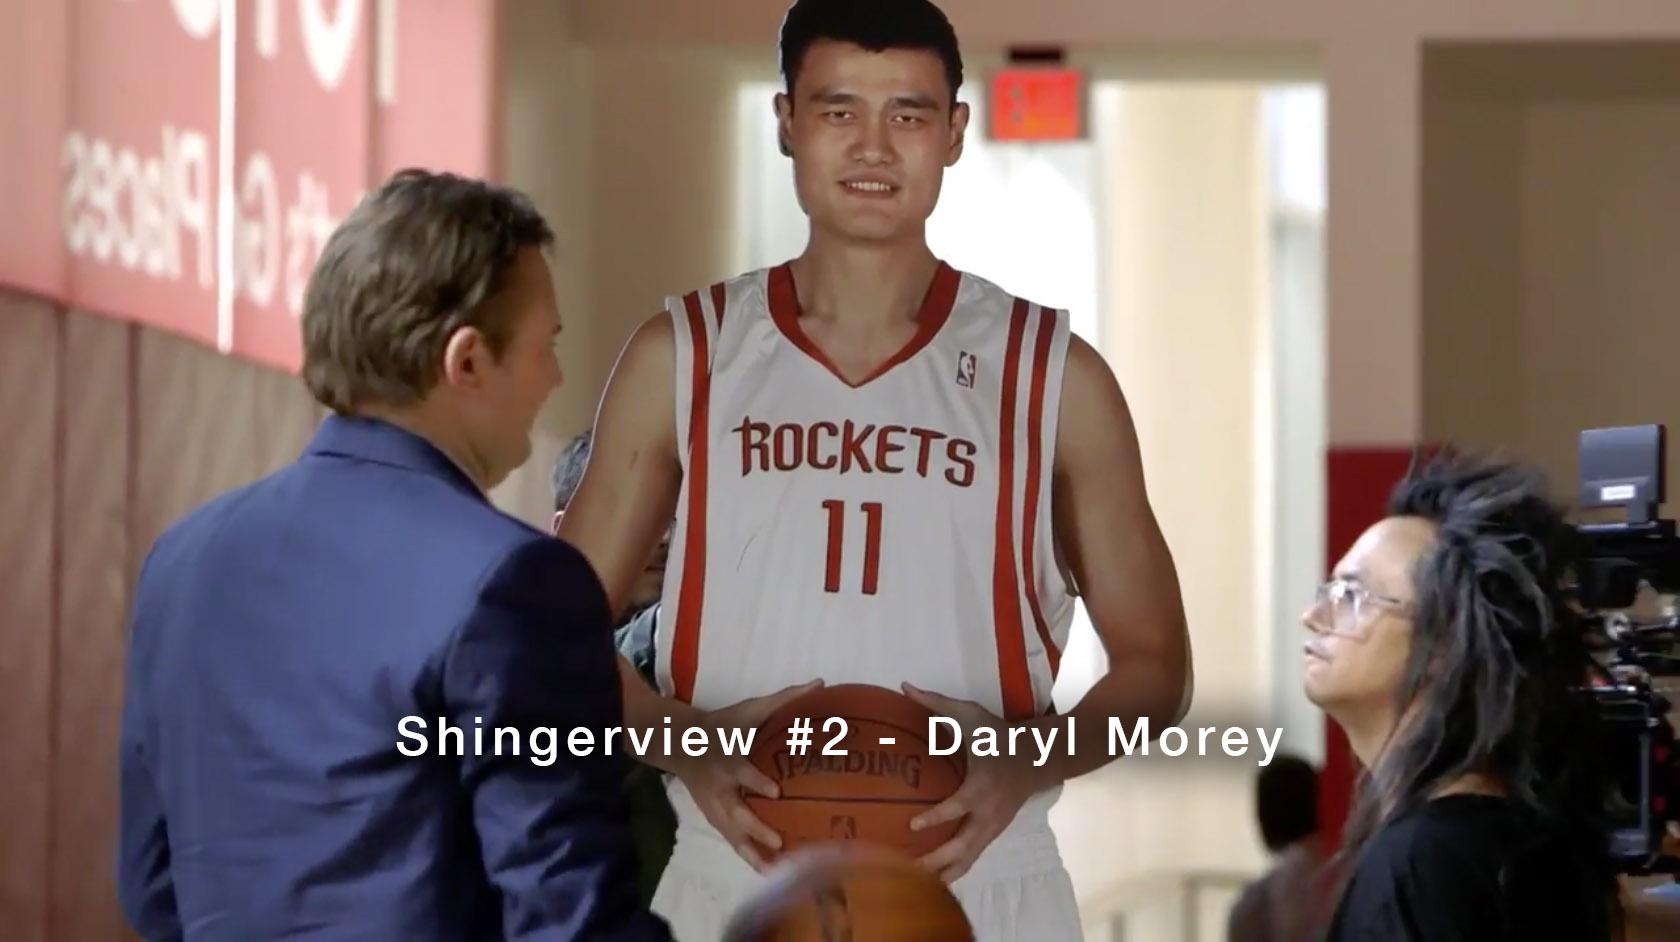 Shingerview #2 - Daryl Morey still